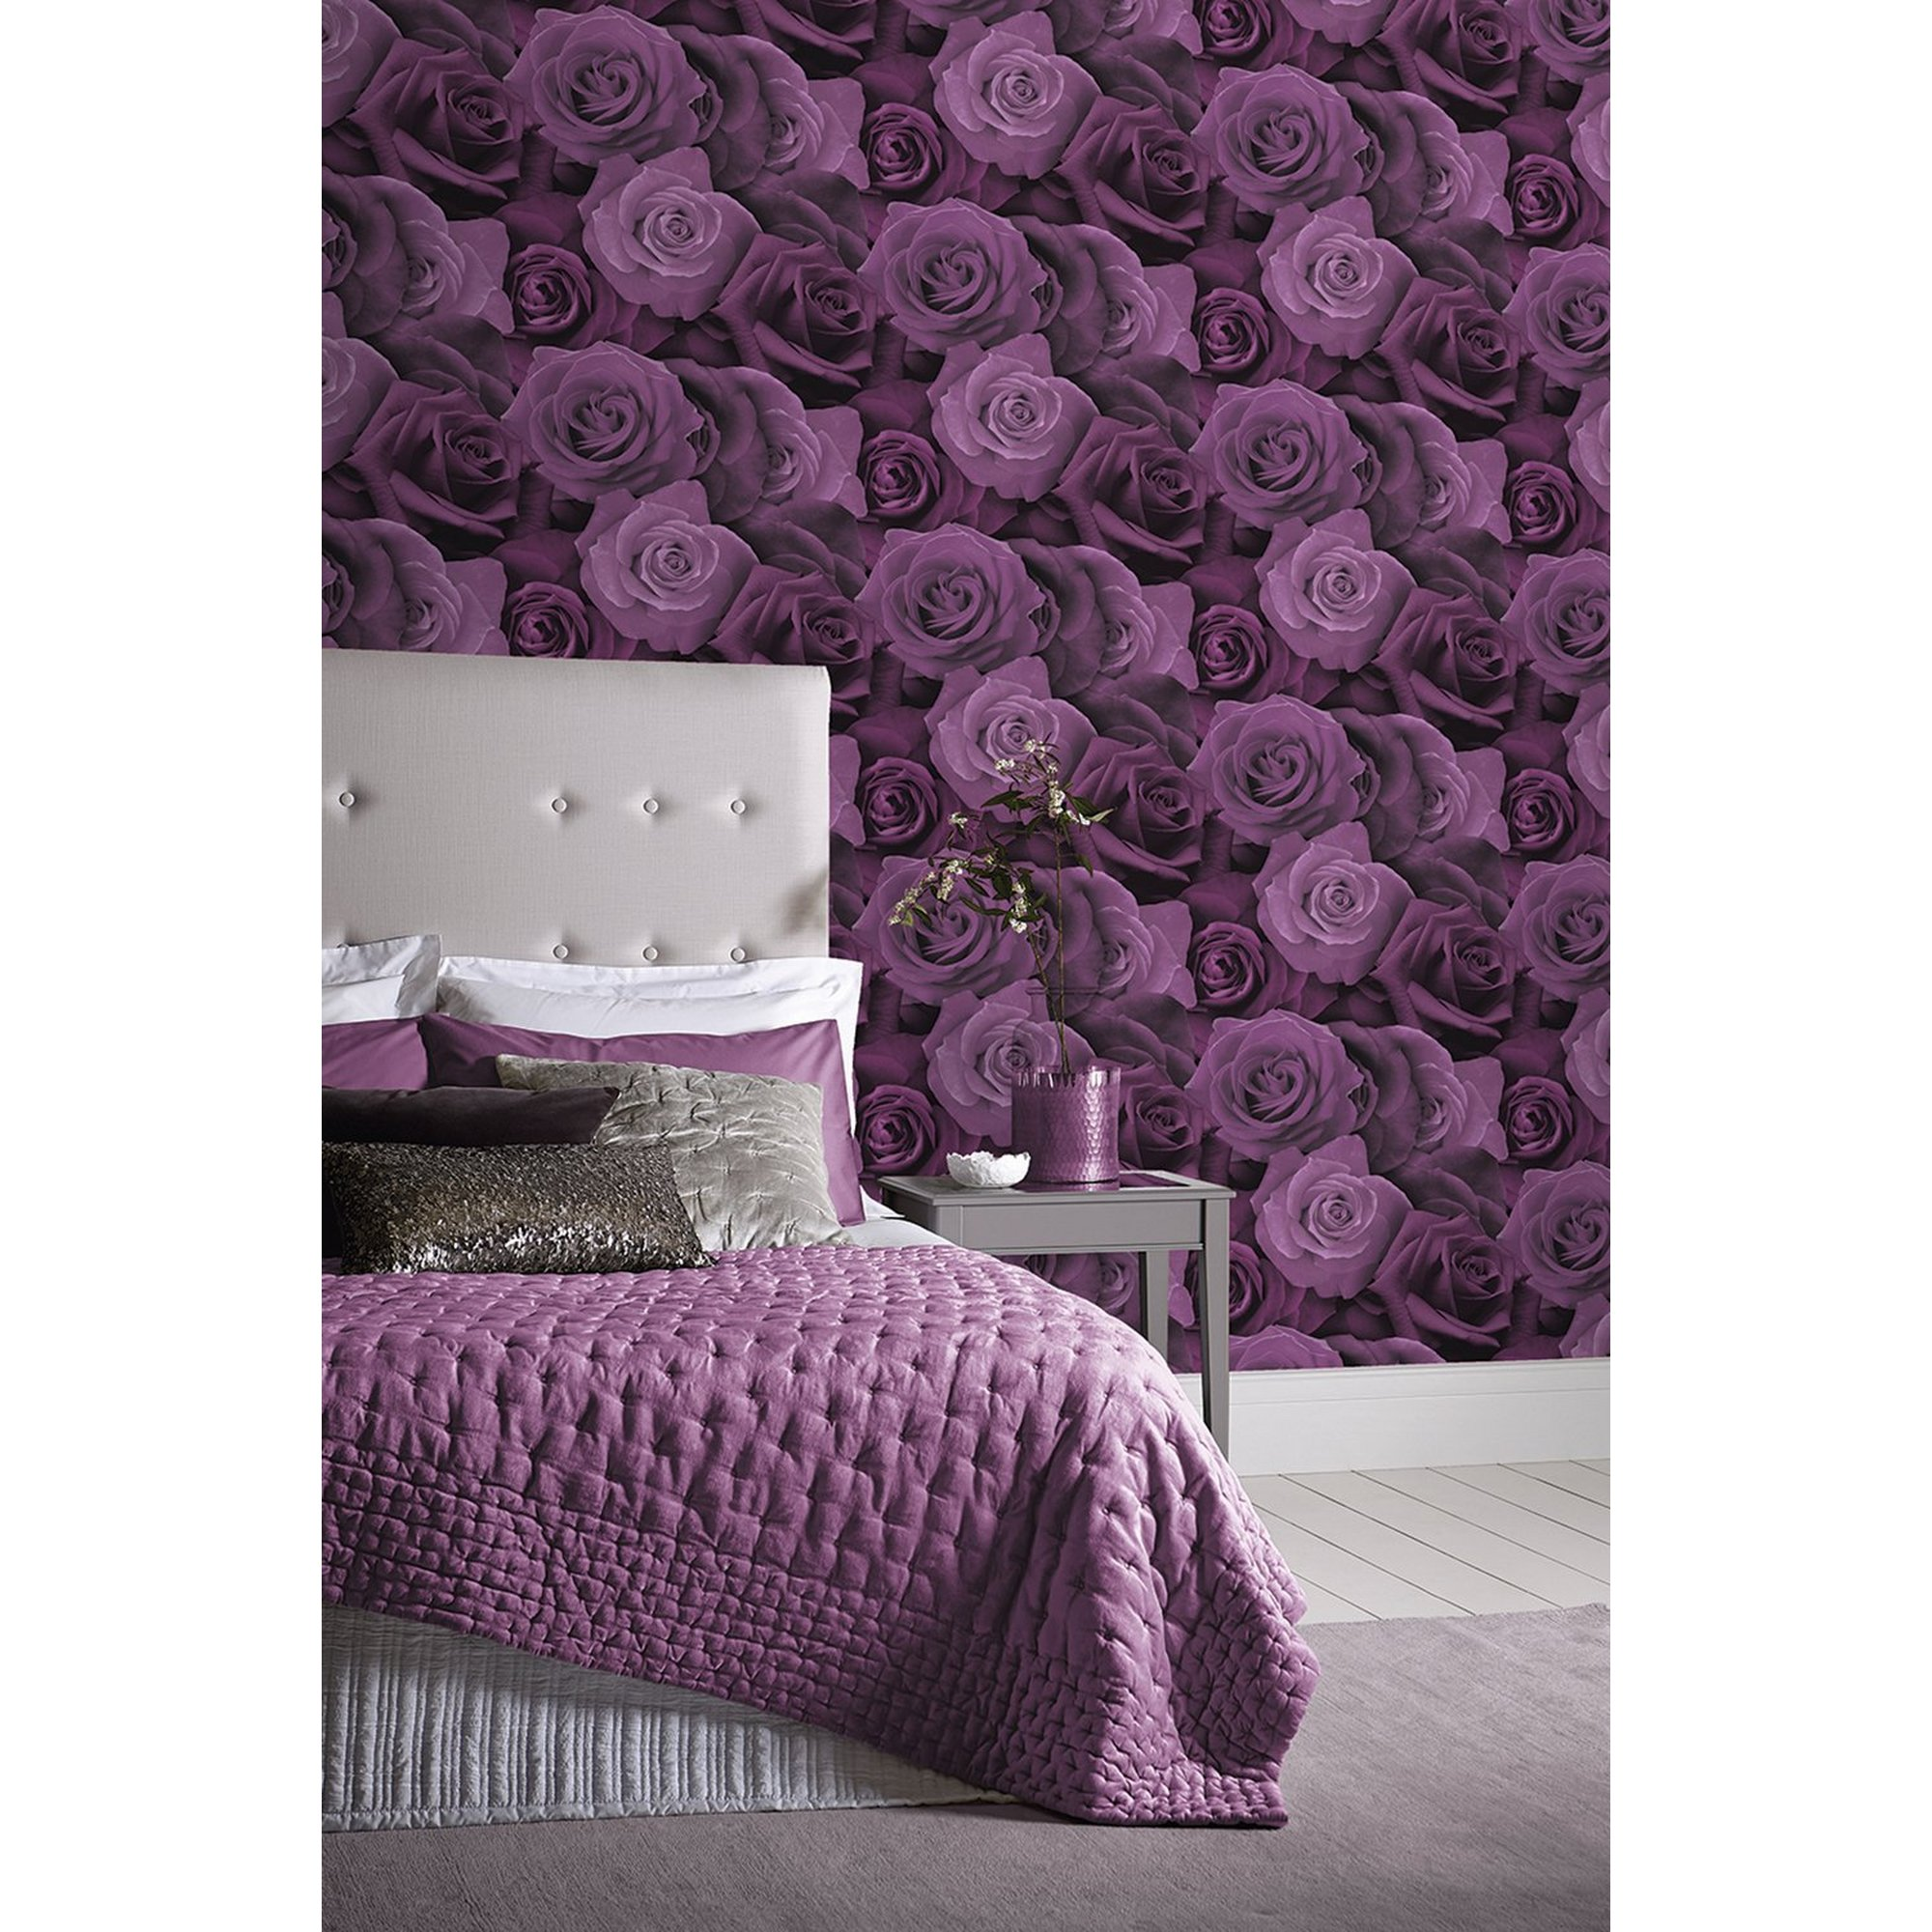 Image of Austin Rose Wallpaper